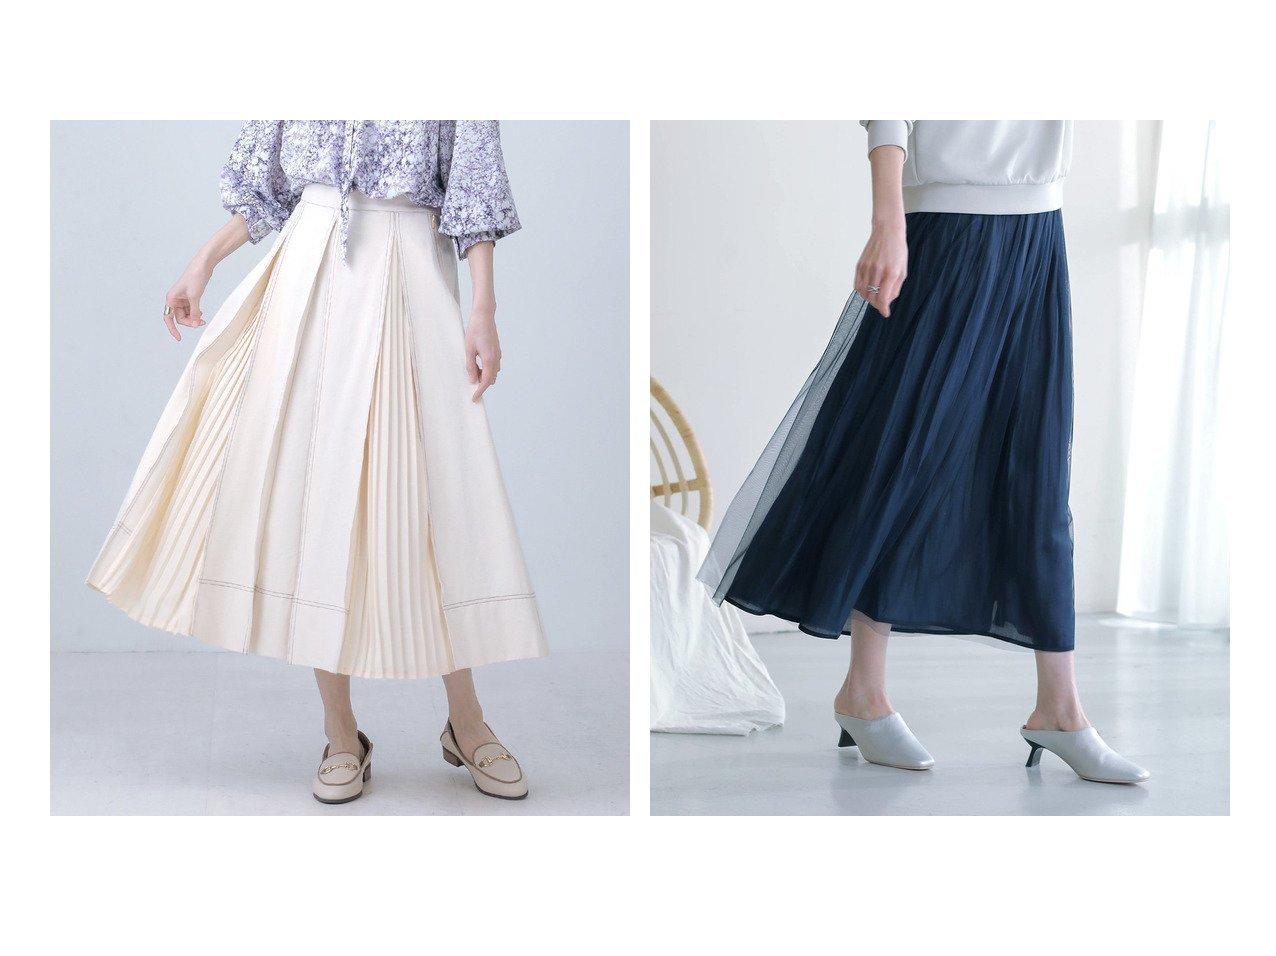 【Bou Jeloud/ブージュルード】の2wayリバーシブルシャイニースカート&タックプリーツデニムスカート スカートのおすすめ!人気、トレンド・レディースファッションの通販 おすすめで人気の流行・トレンド、ファッションの通販商品 メンズファッション・キッズファッション・インテリア・家具・レディースファッション・服の通販 founy(ファニー) https://founy.com/ ファッション Fashion レディースファッション WOMEN スカート Skirt デニムスカート Denim Skirts Aライン/フレアスカート Flared A-Line Skirts NEW・新作・新着・新入荷 New Arrivals ギャザー スマート デニム フレア プリーツ ポケット シャイニー チュール リバーシブル ロング |ID:crp329100000022484